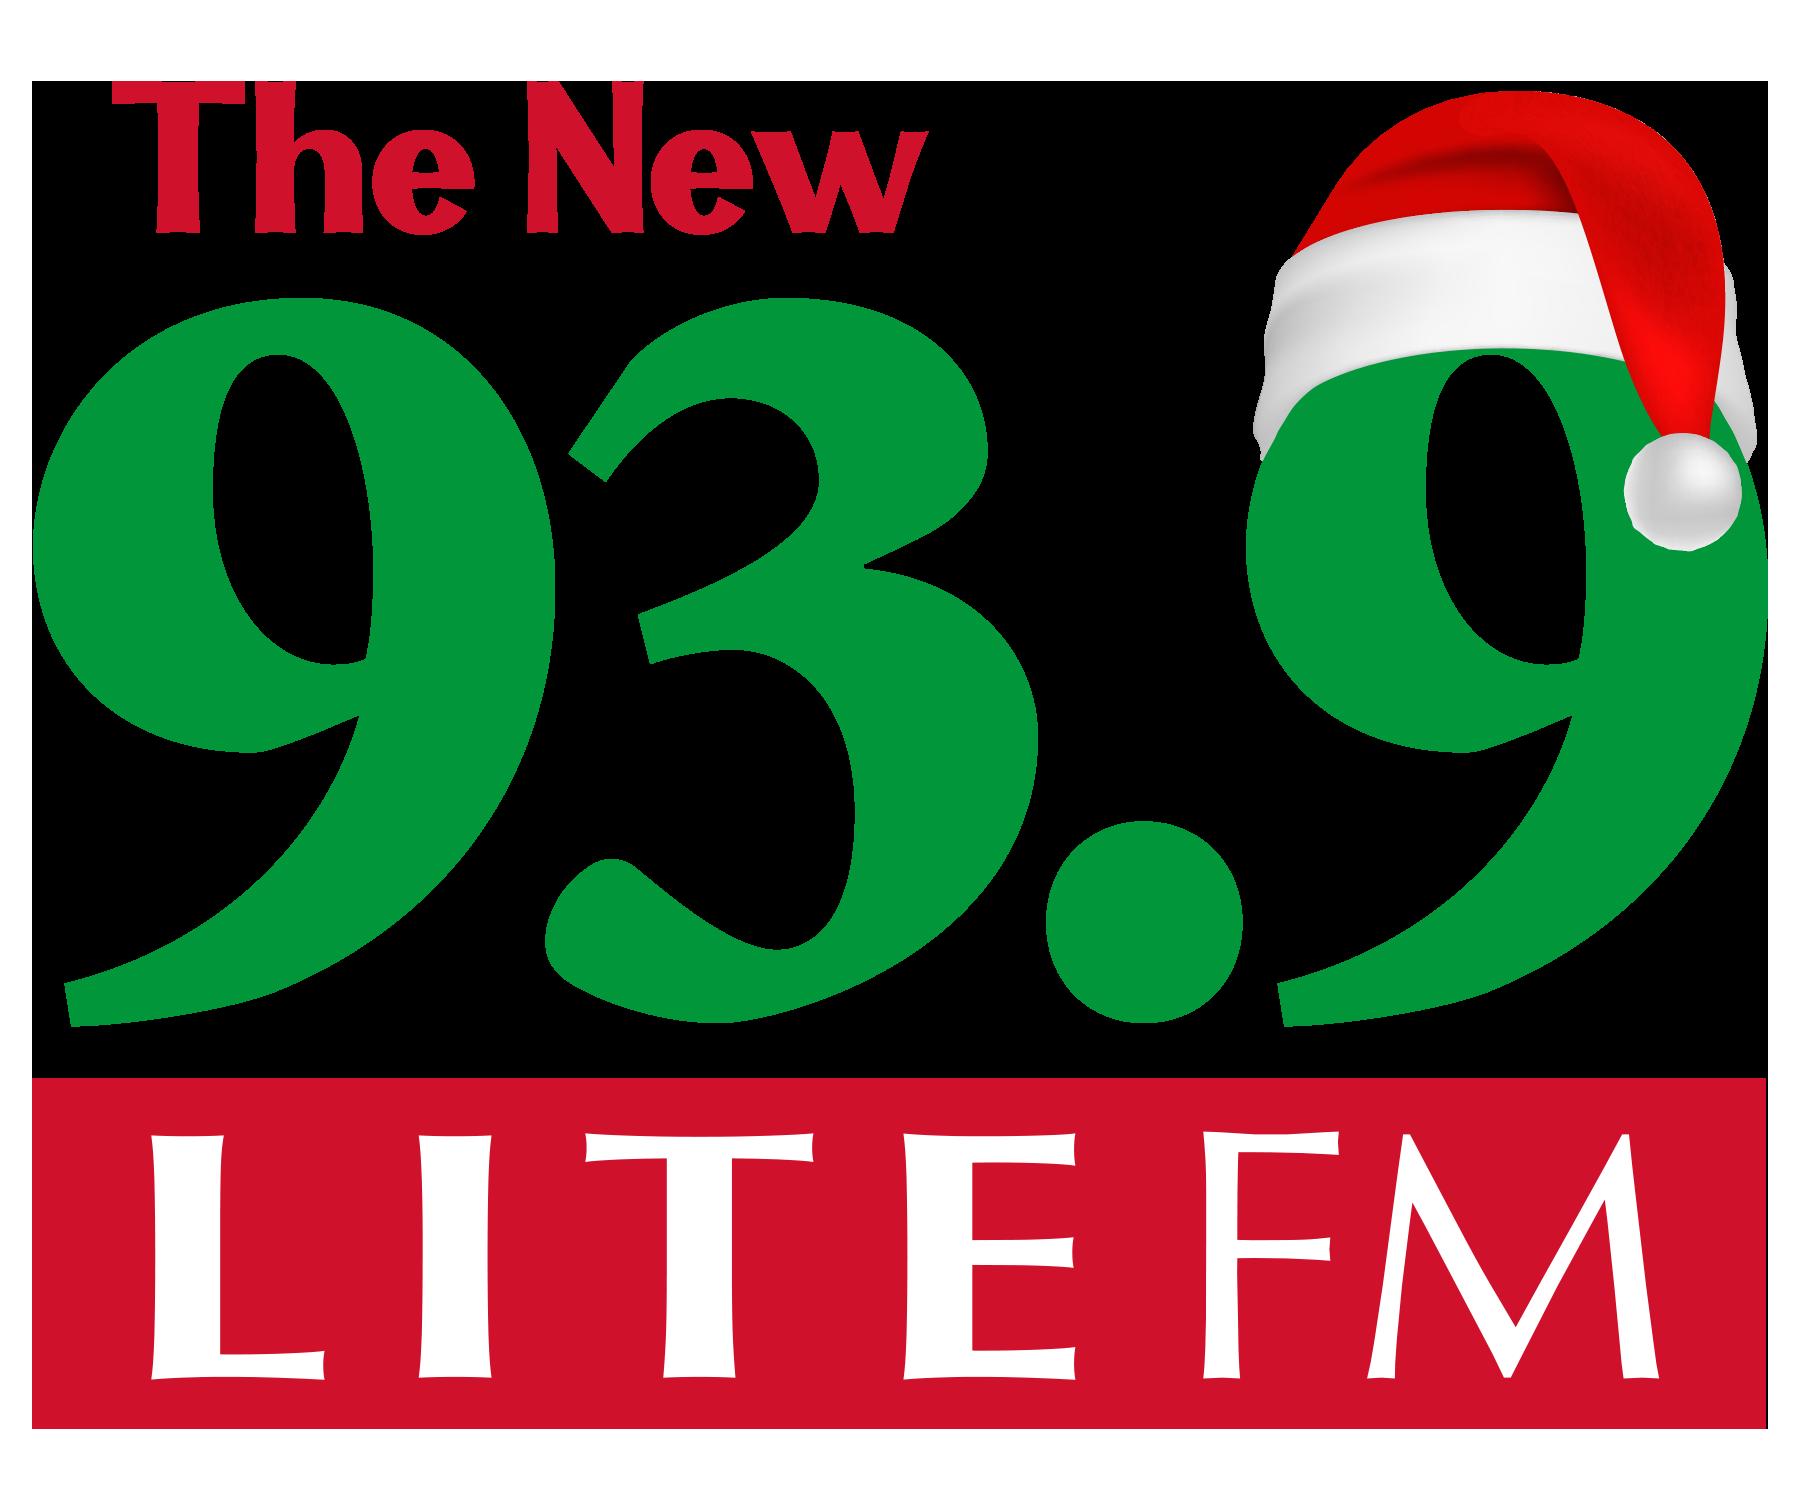 939 lite fm chicagos christmas music station - Chicago Christmas Station